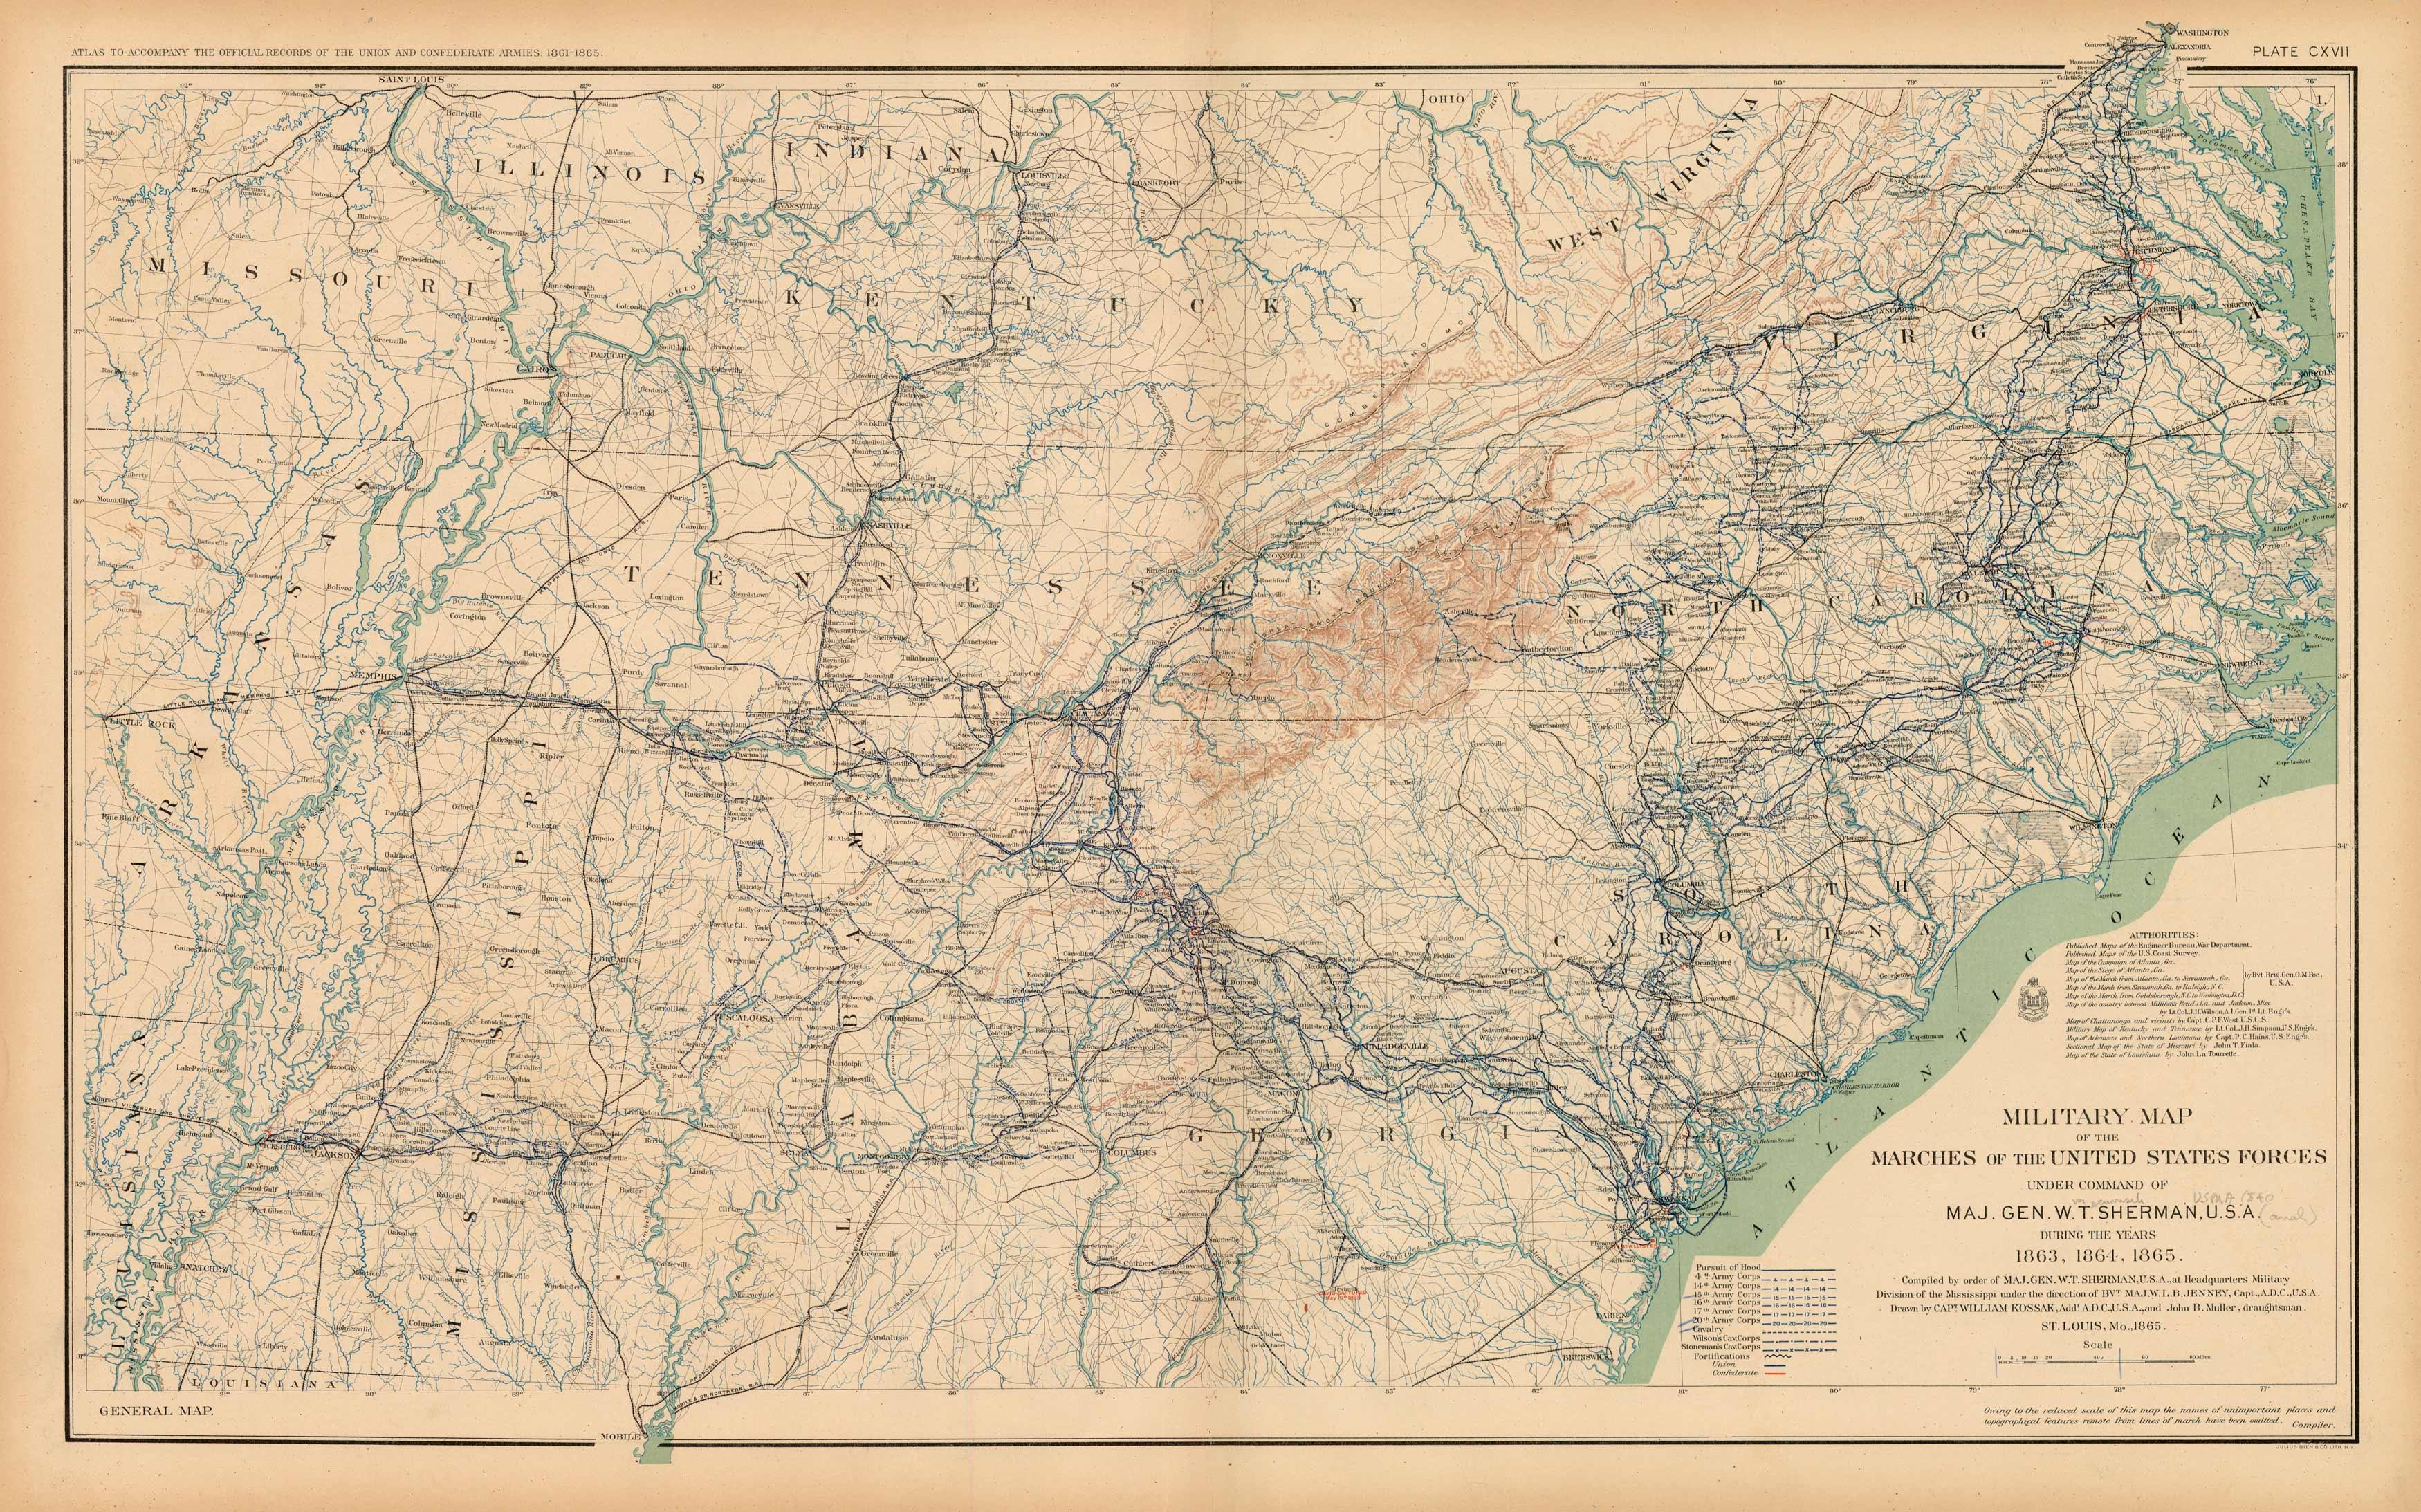 Civil War Atlas; Plate 117; Battle Map of Marches Under General Sherman